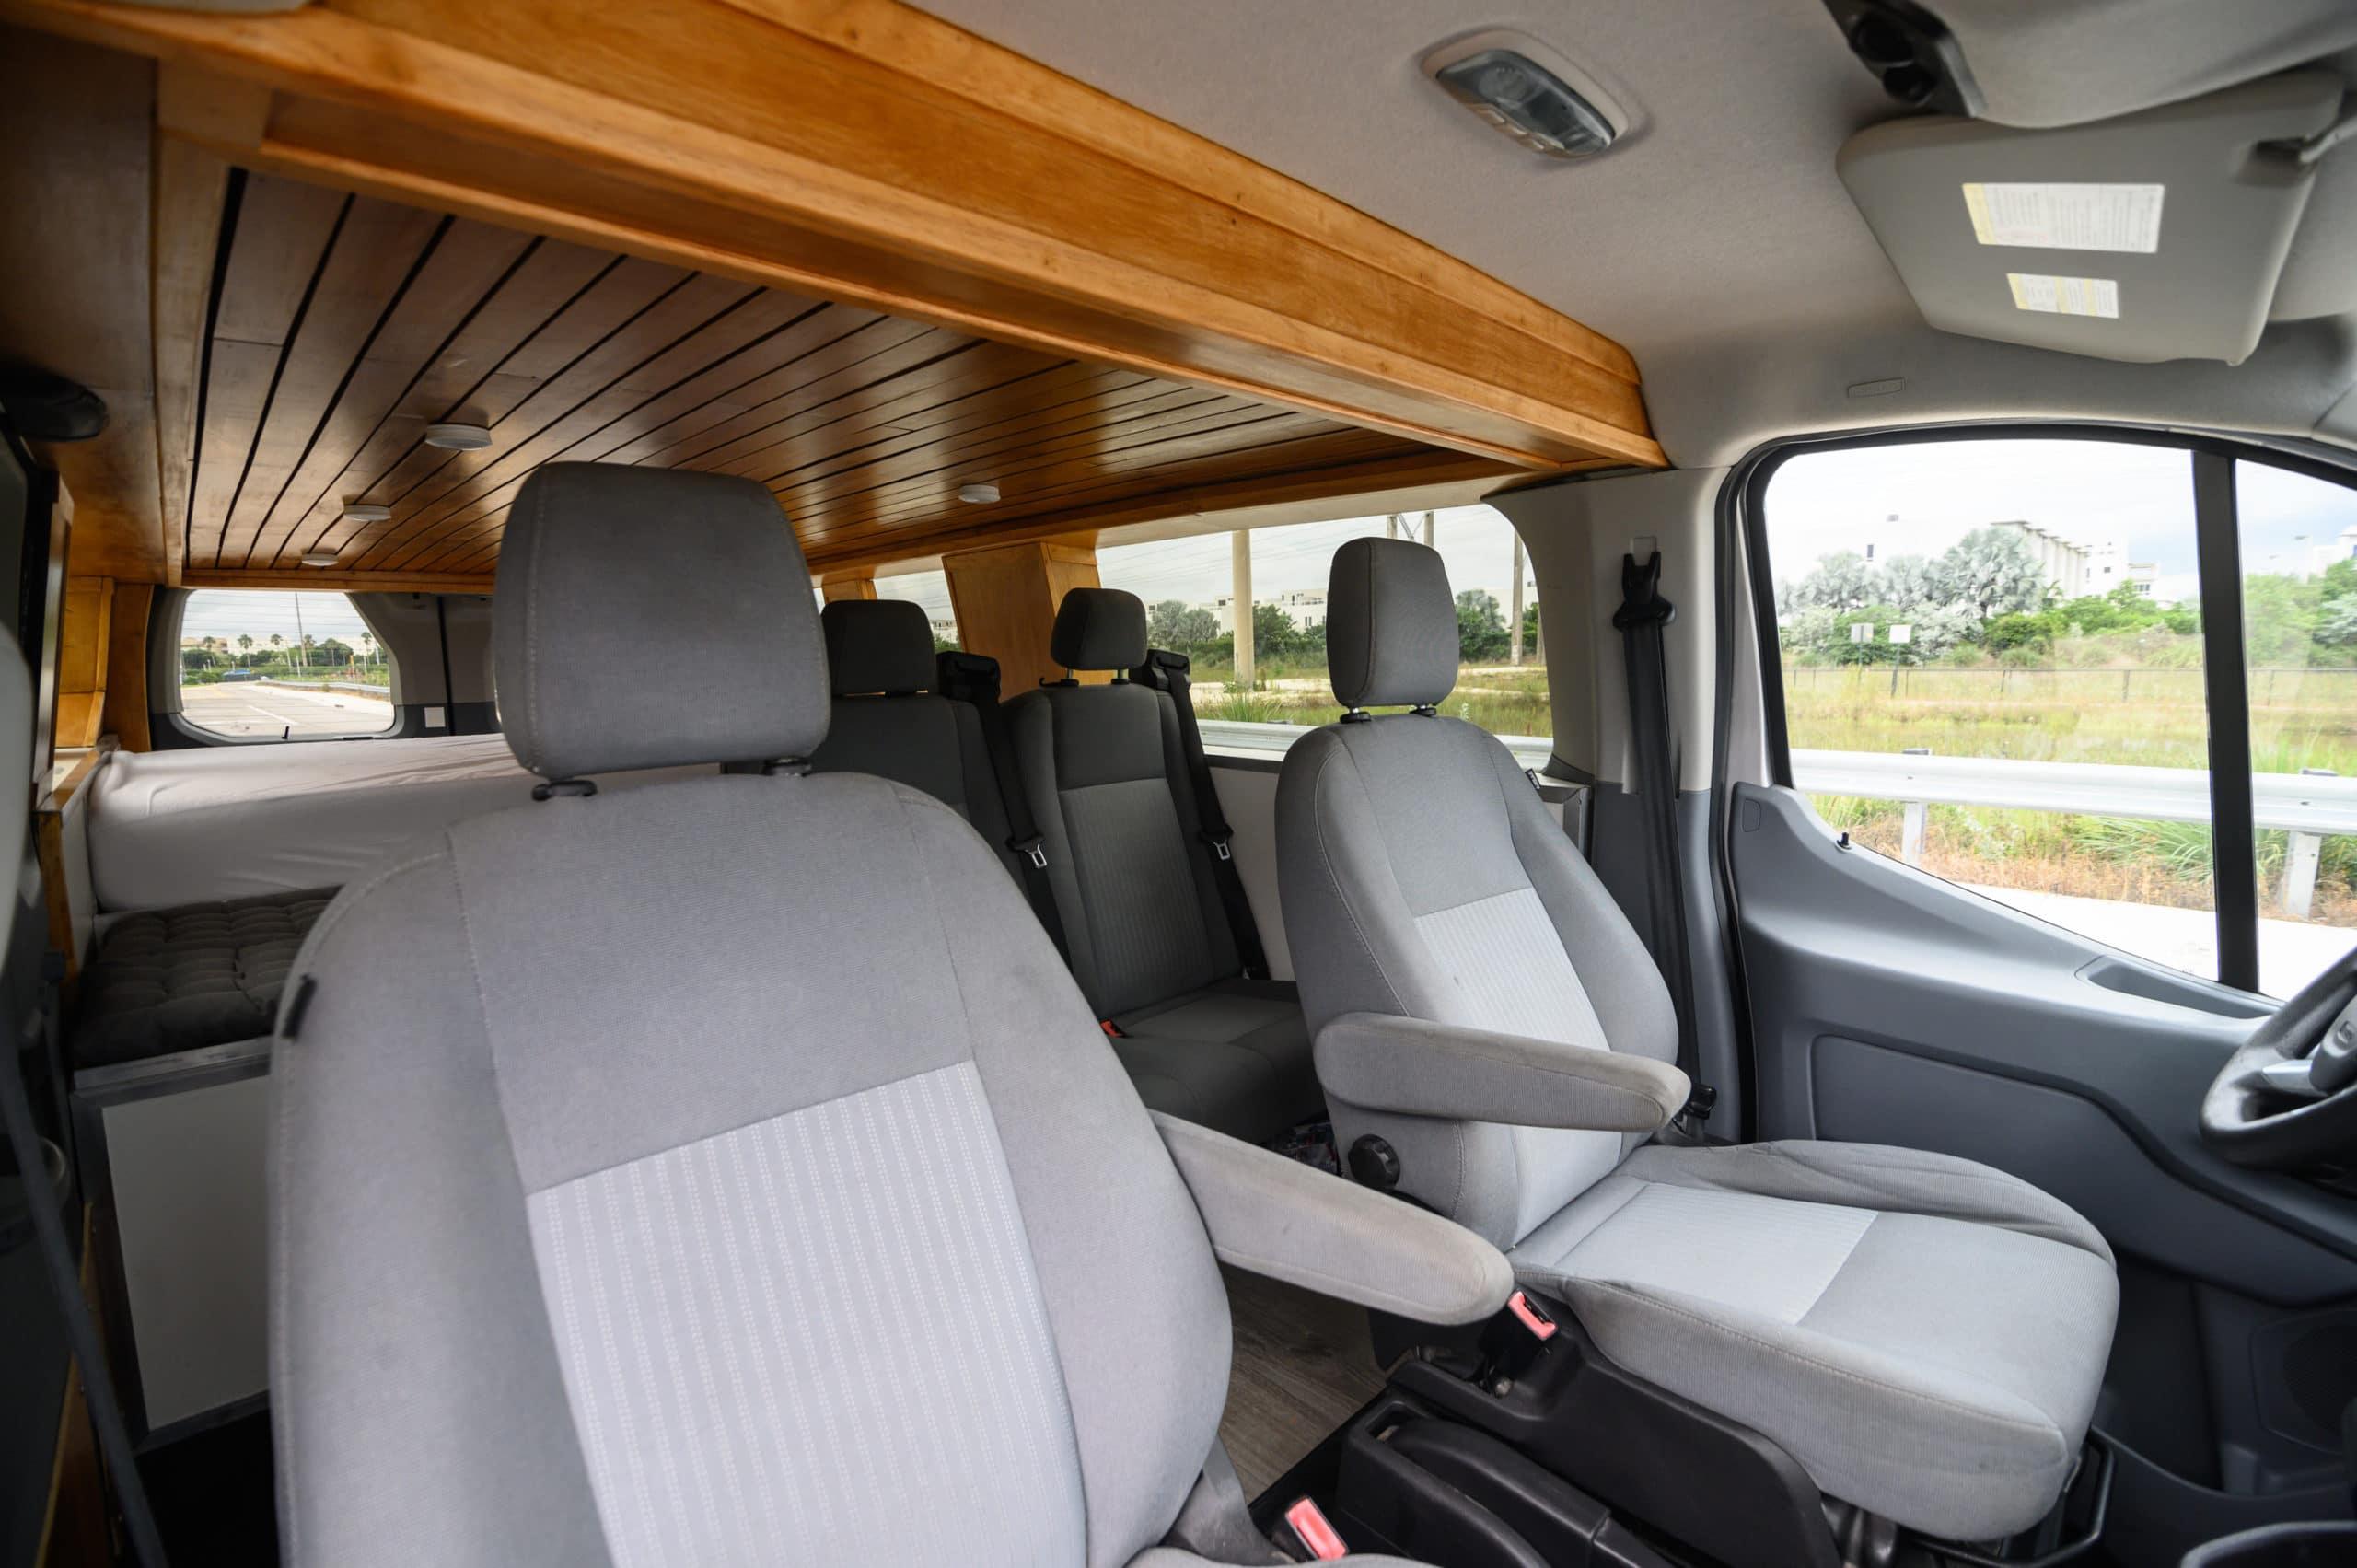 Seats 4 travelers. Ford Transit 2015